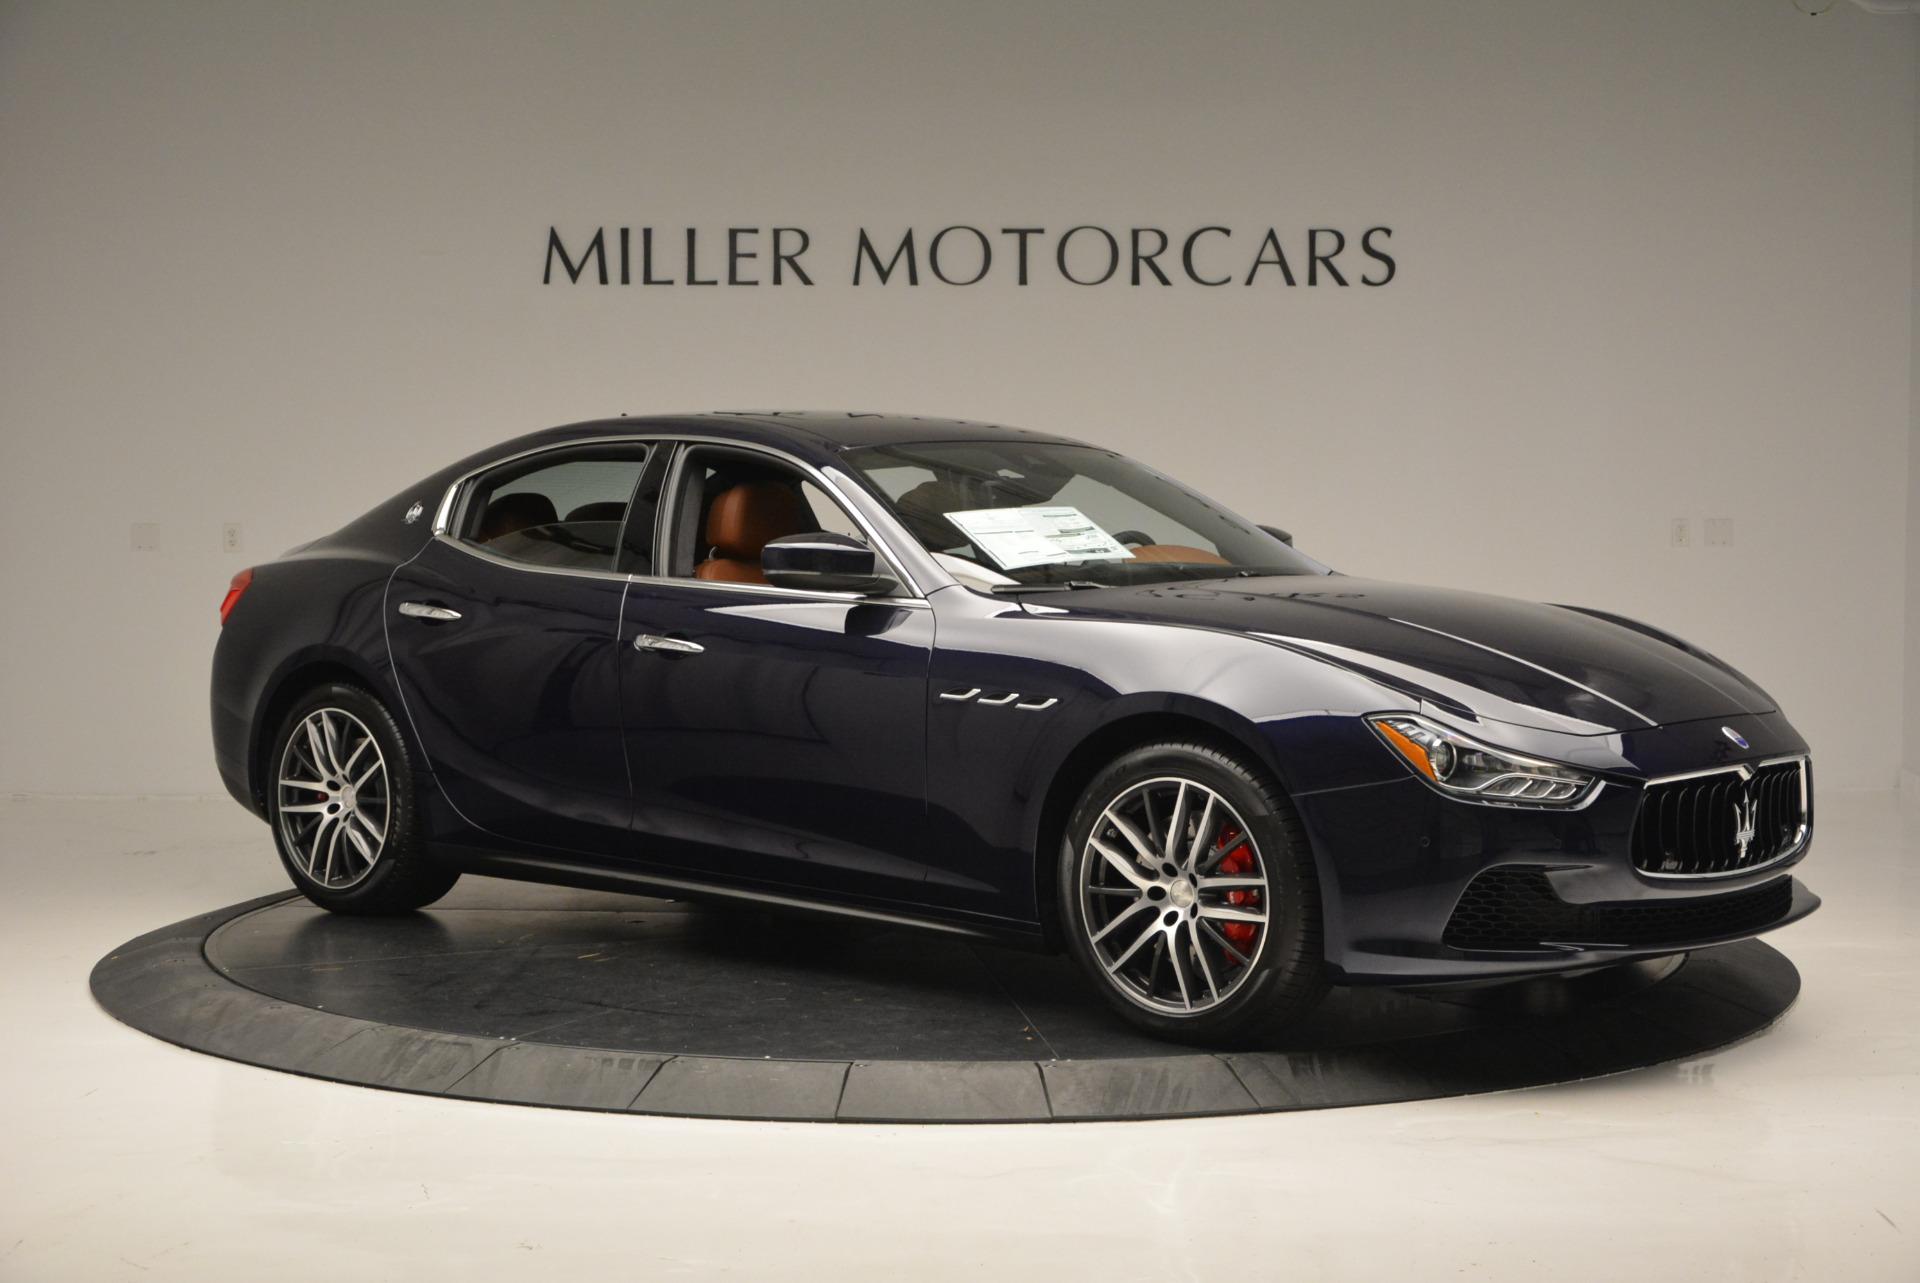 Used 2017 Maserati Ghibli S Q4 - EX Loaner For Sale In Greenwich, CT. Alfa Romeo of Greenwich, M1662 568_p10